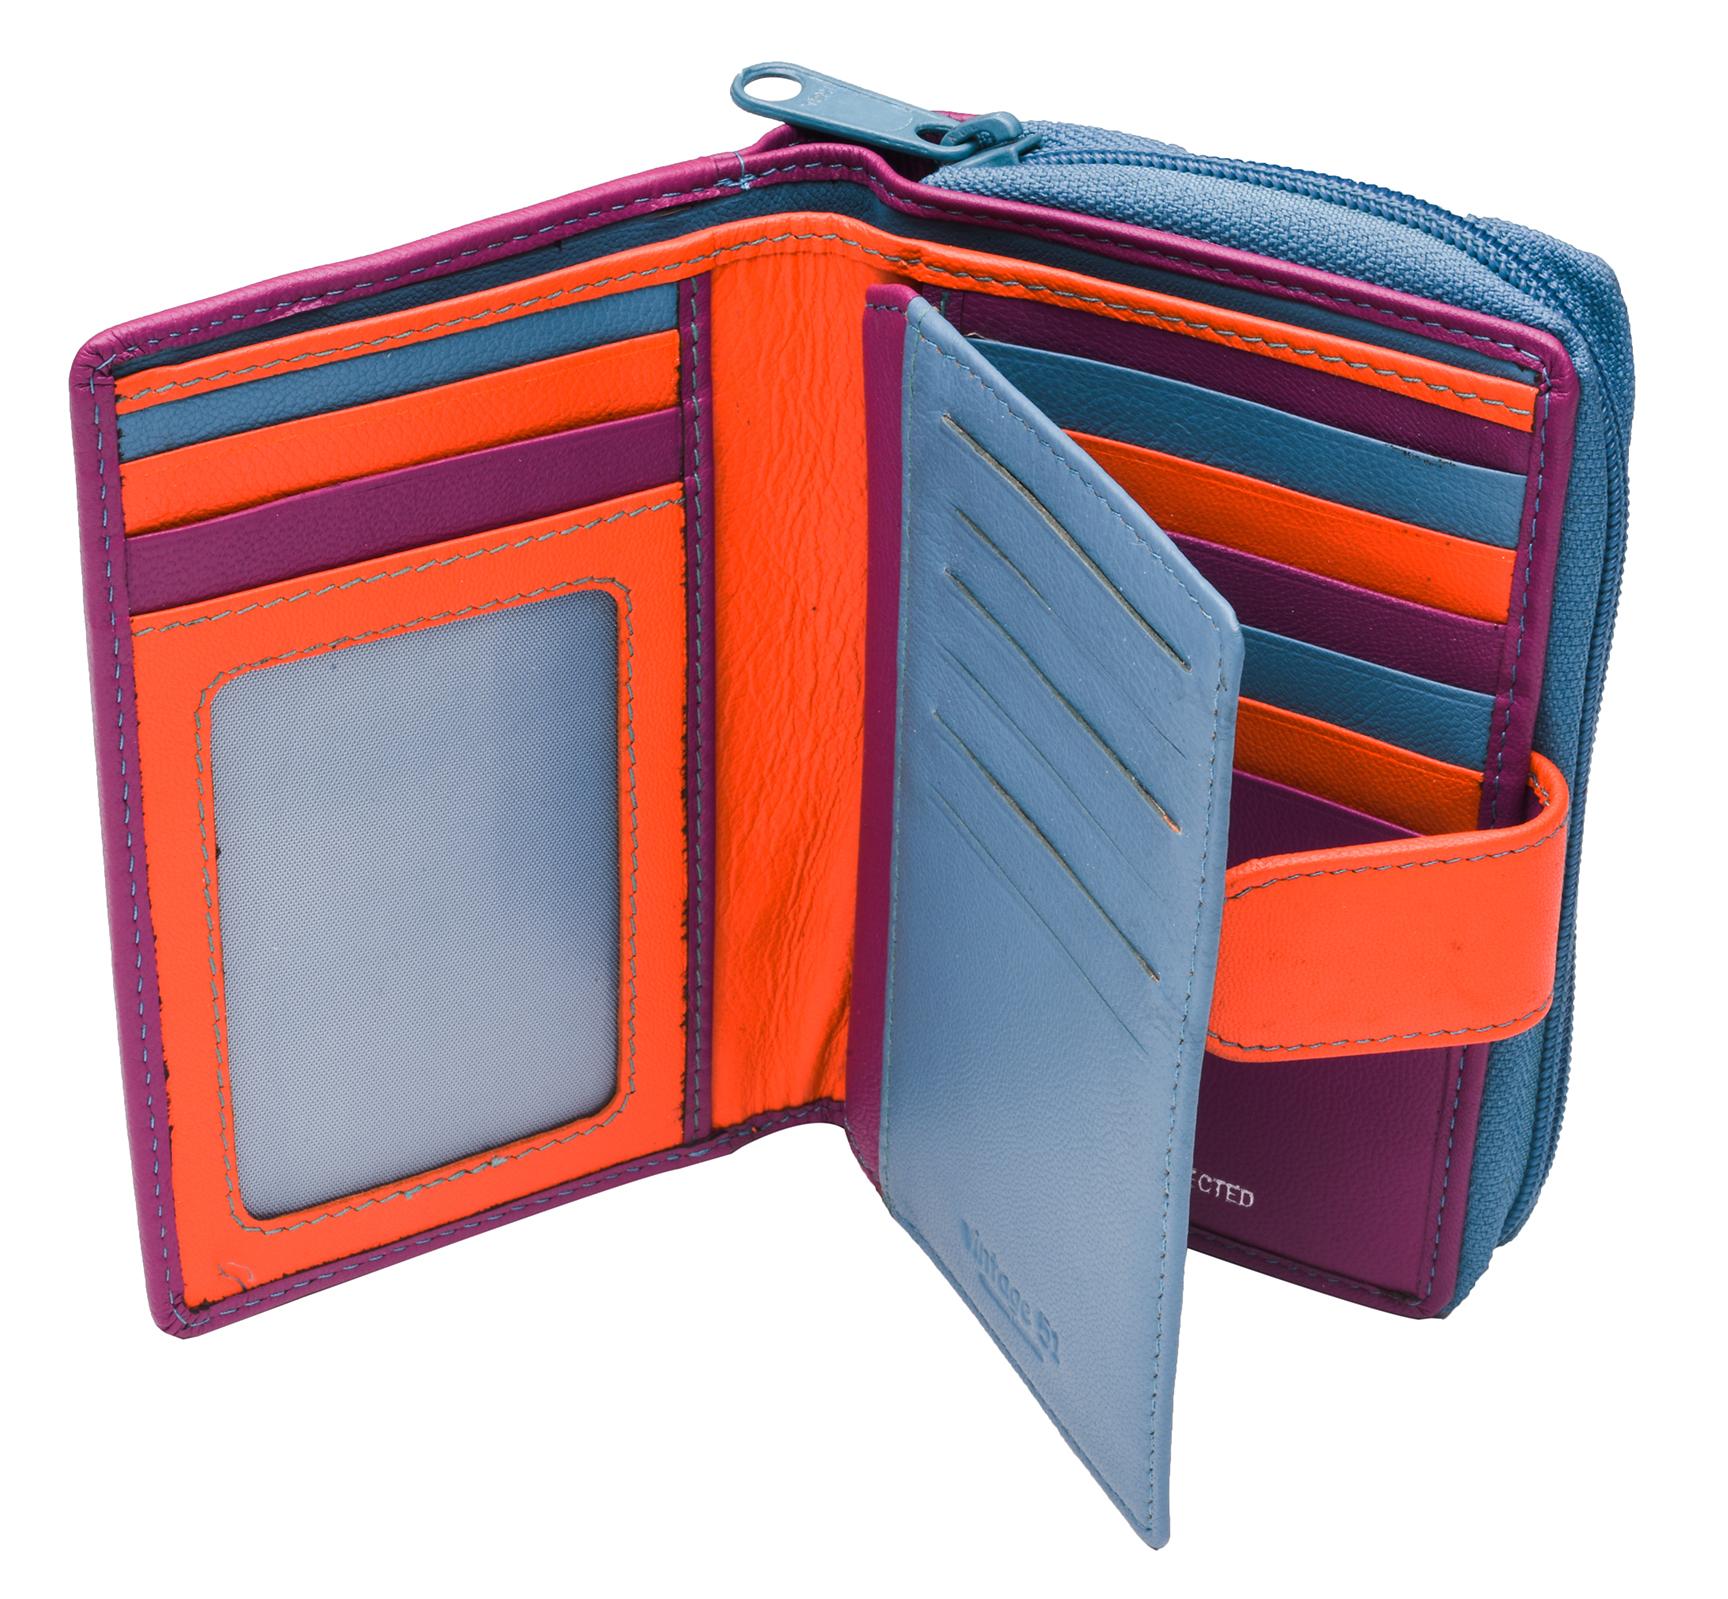 Ladies-Womens-RFID-Blocking-Safe-Leather-Bifold-Medium-Purse-Wallet-Coin-Section thumbnail 8